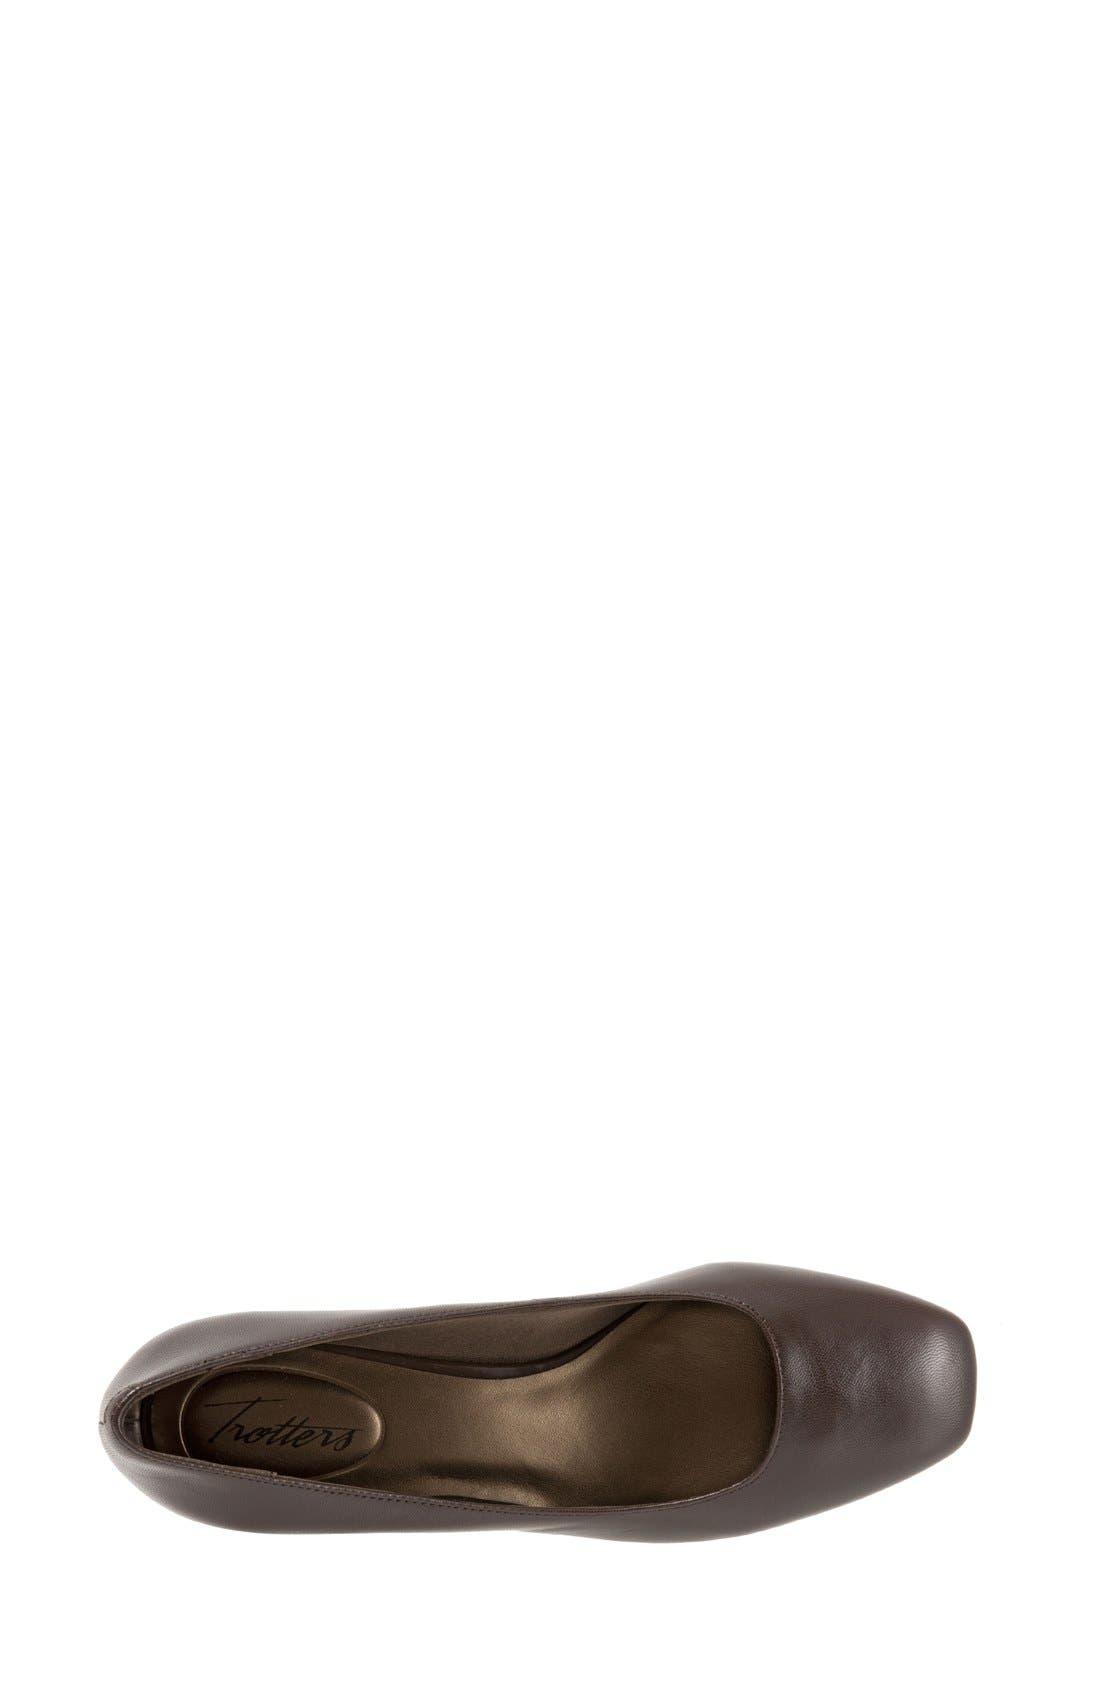 Lola Pump,                             Alternate thumbnail 3, color,                             Dark Brown Leather